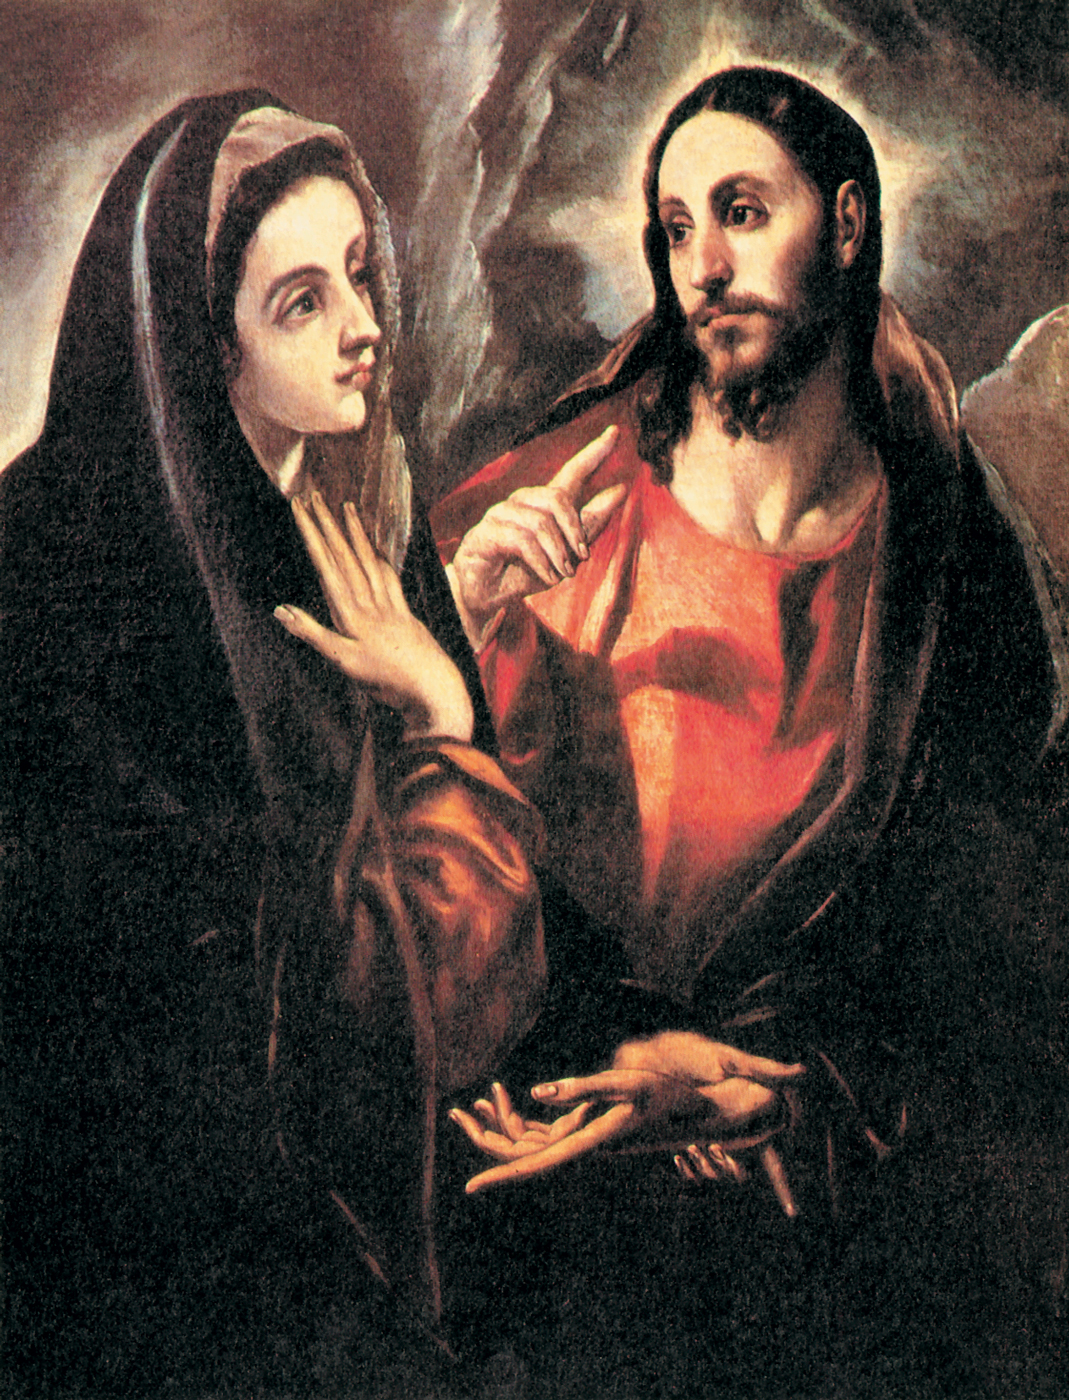 El Greco (Domínikos Theotokópoulos), Katedrála v Tolede